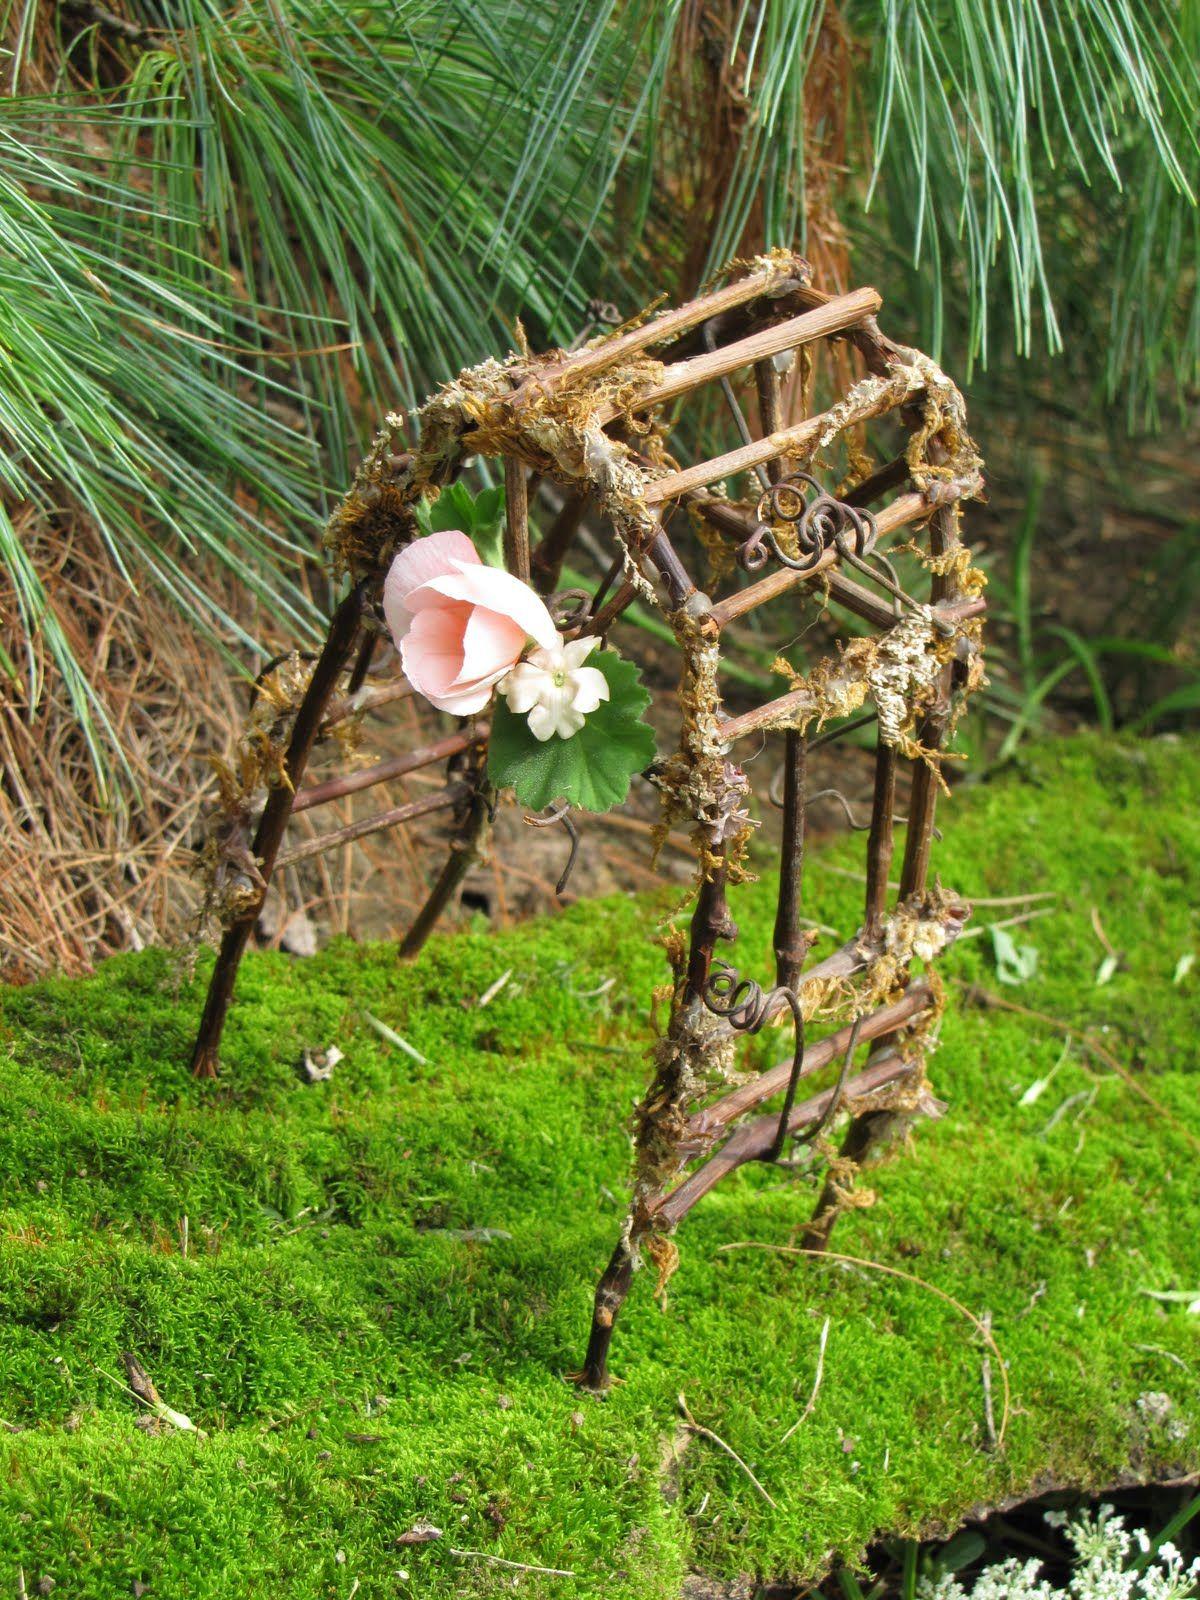 How To Make Fairy Furniture | The Backyard Explorer: Fairy Furniture